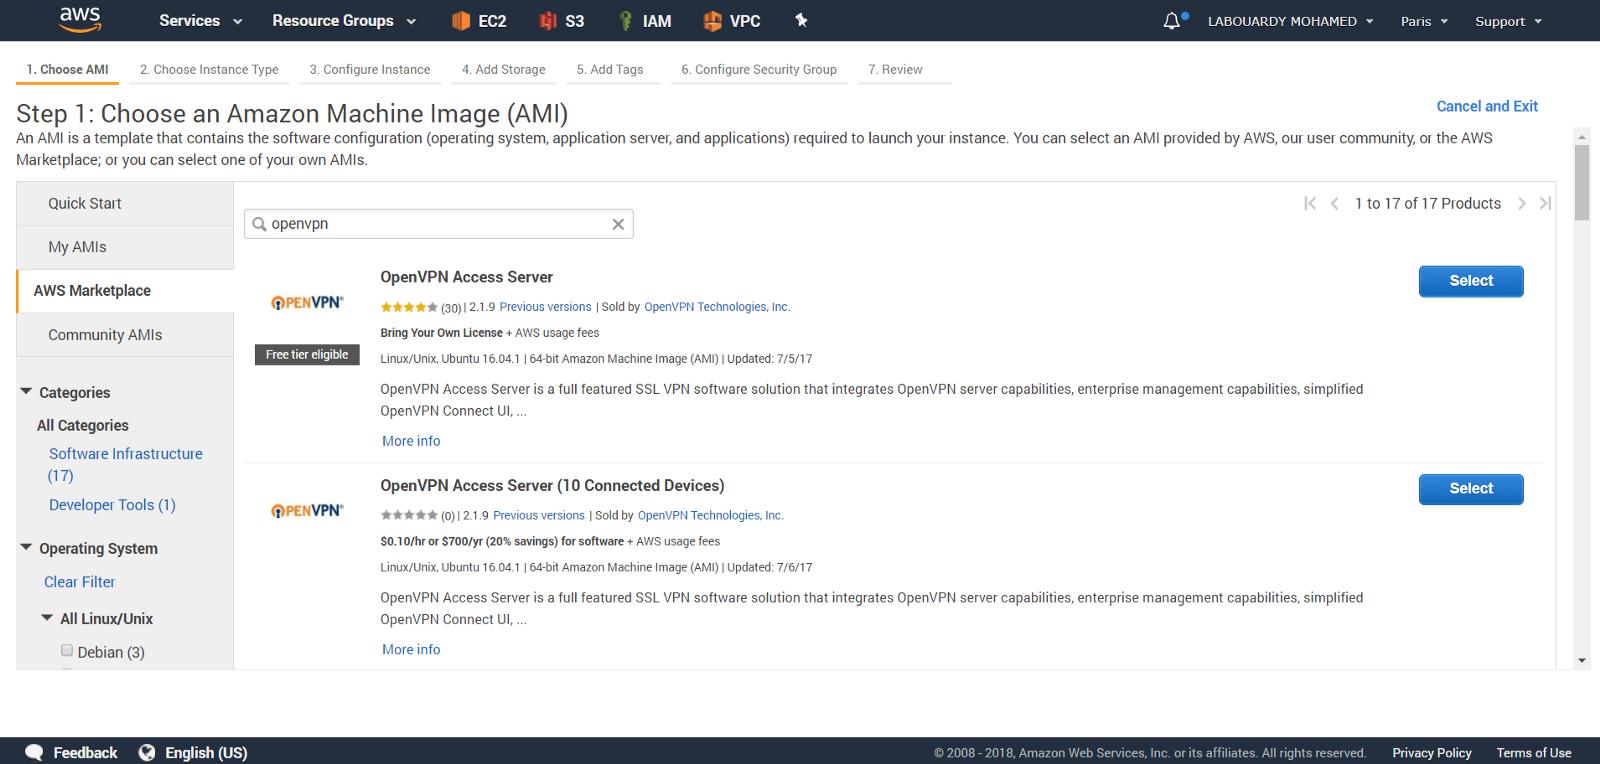 AWS OpenVPN Access Server - By